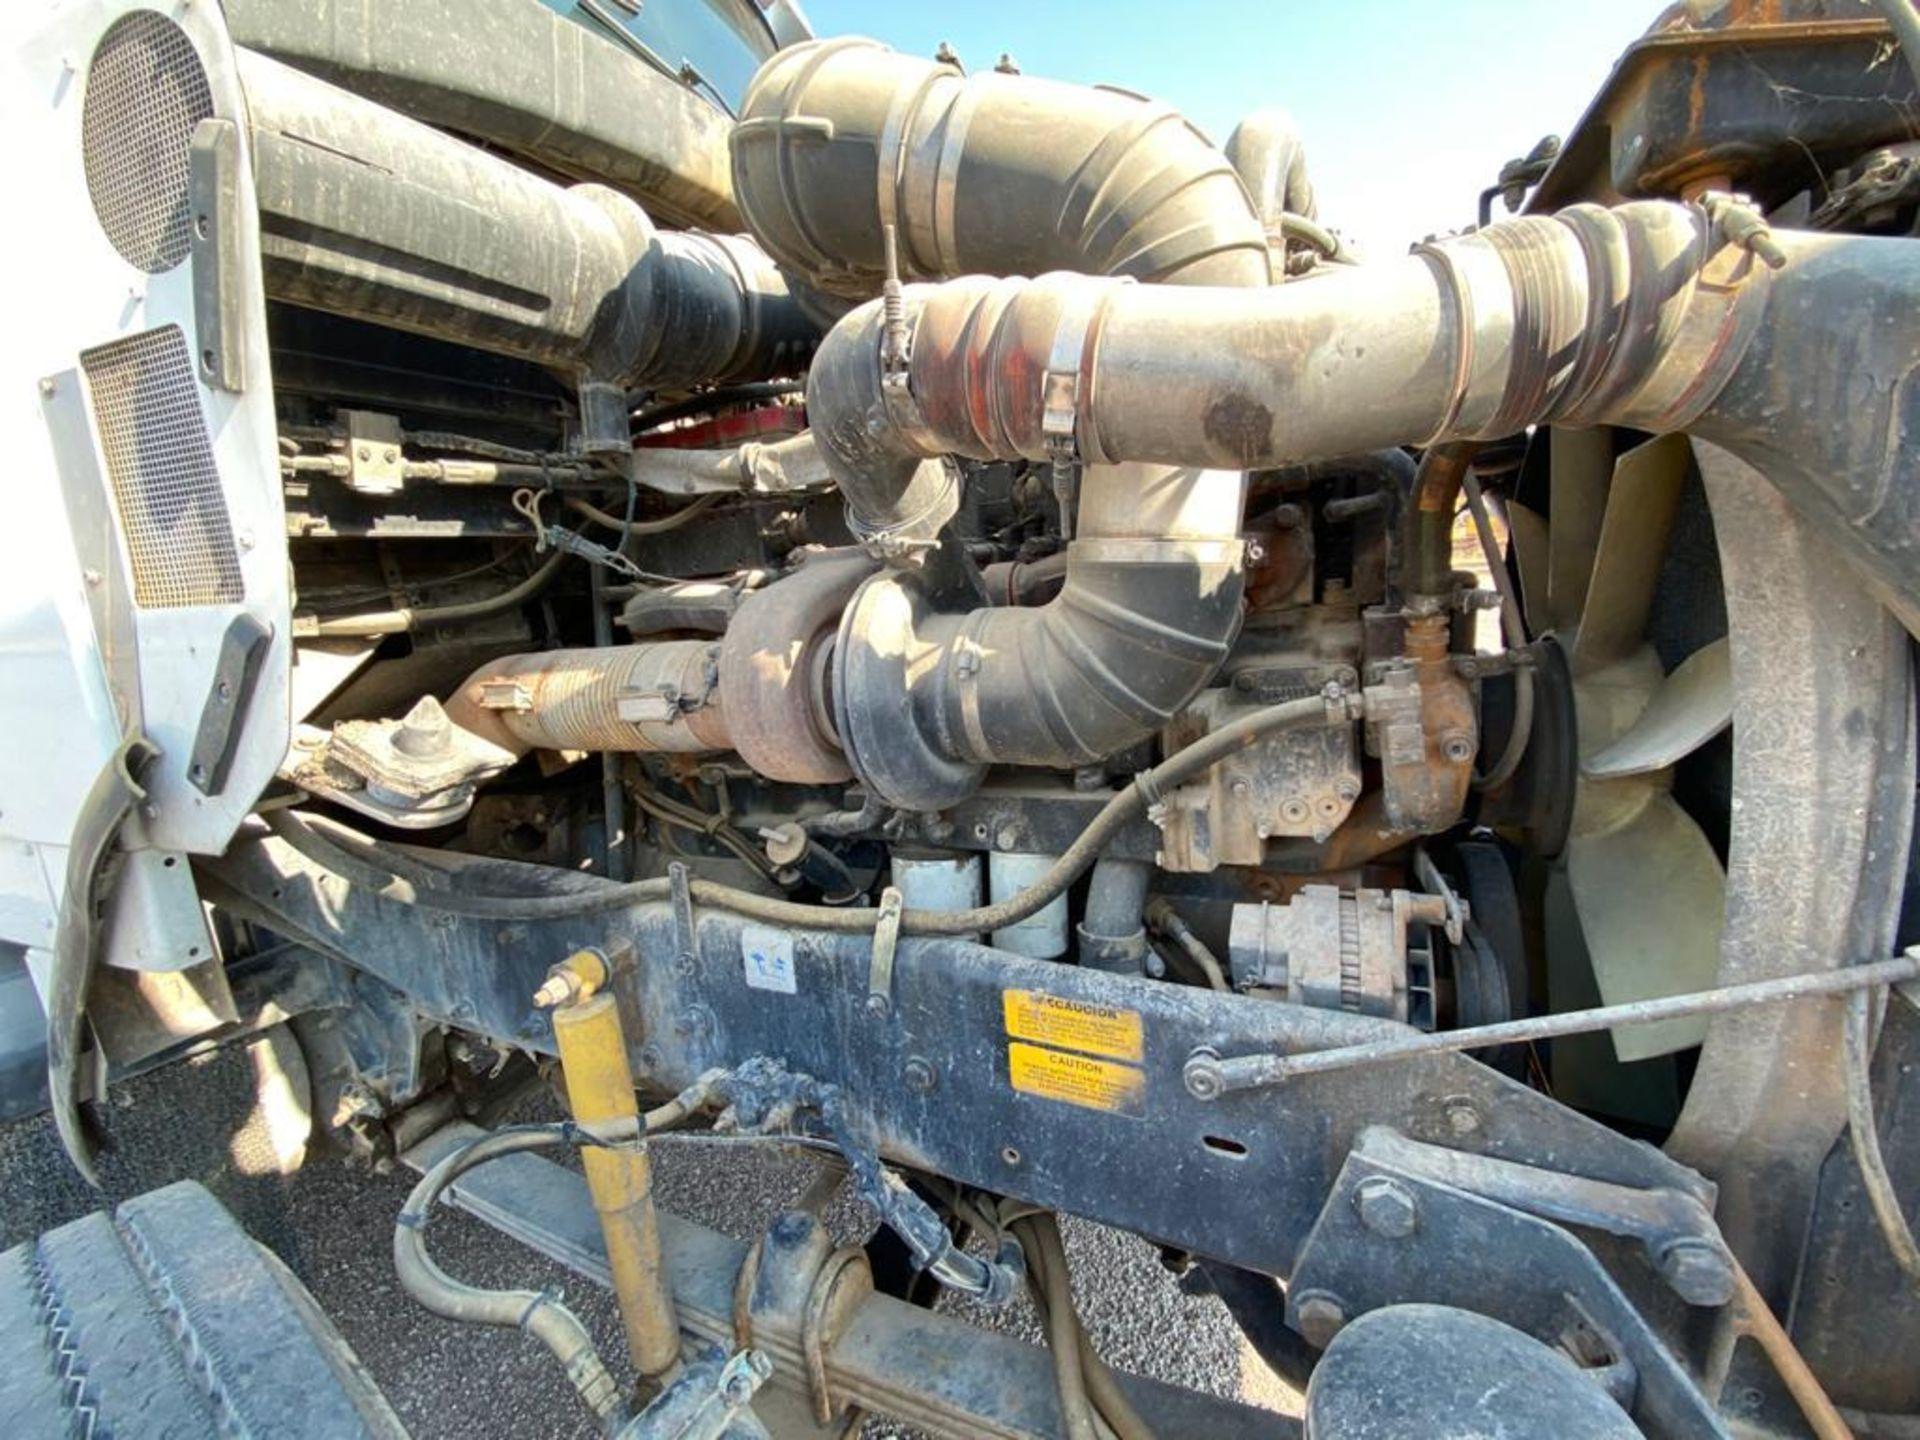 1998 Kenworth Sleeper Truck Tractor, standard transmission of 18 speeds - Image 48 of 55